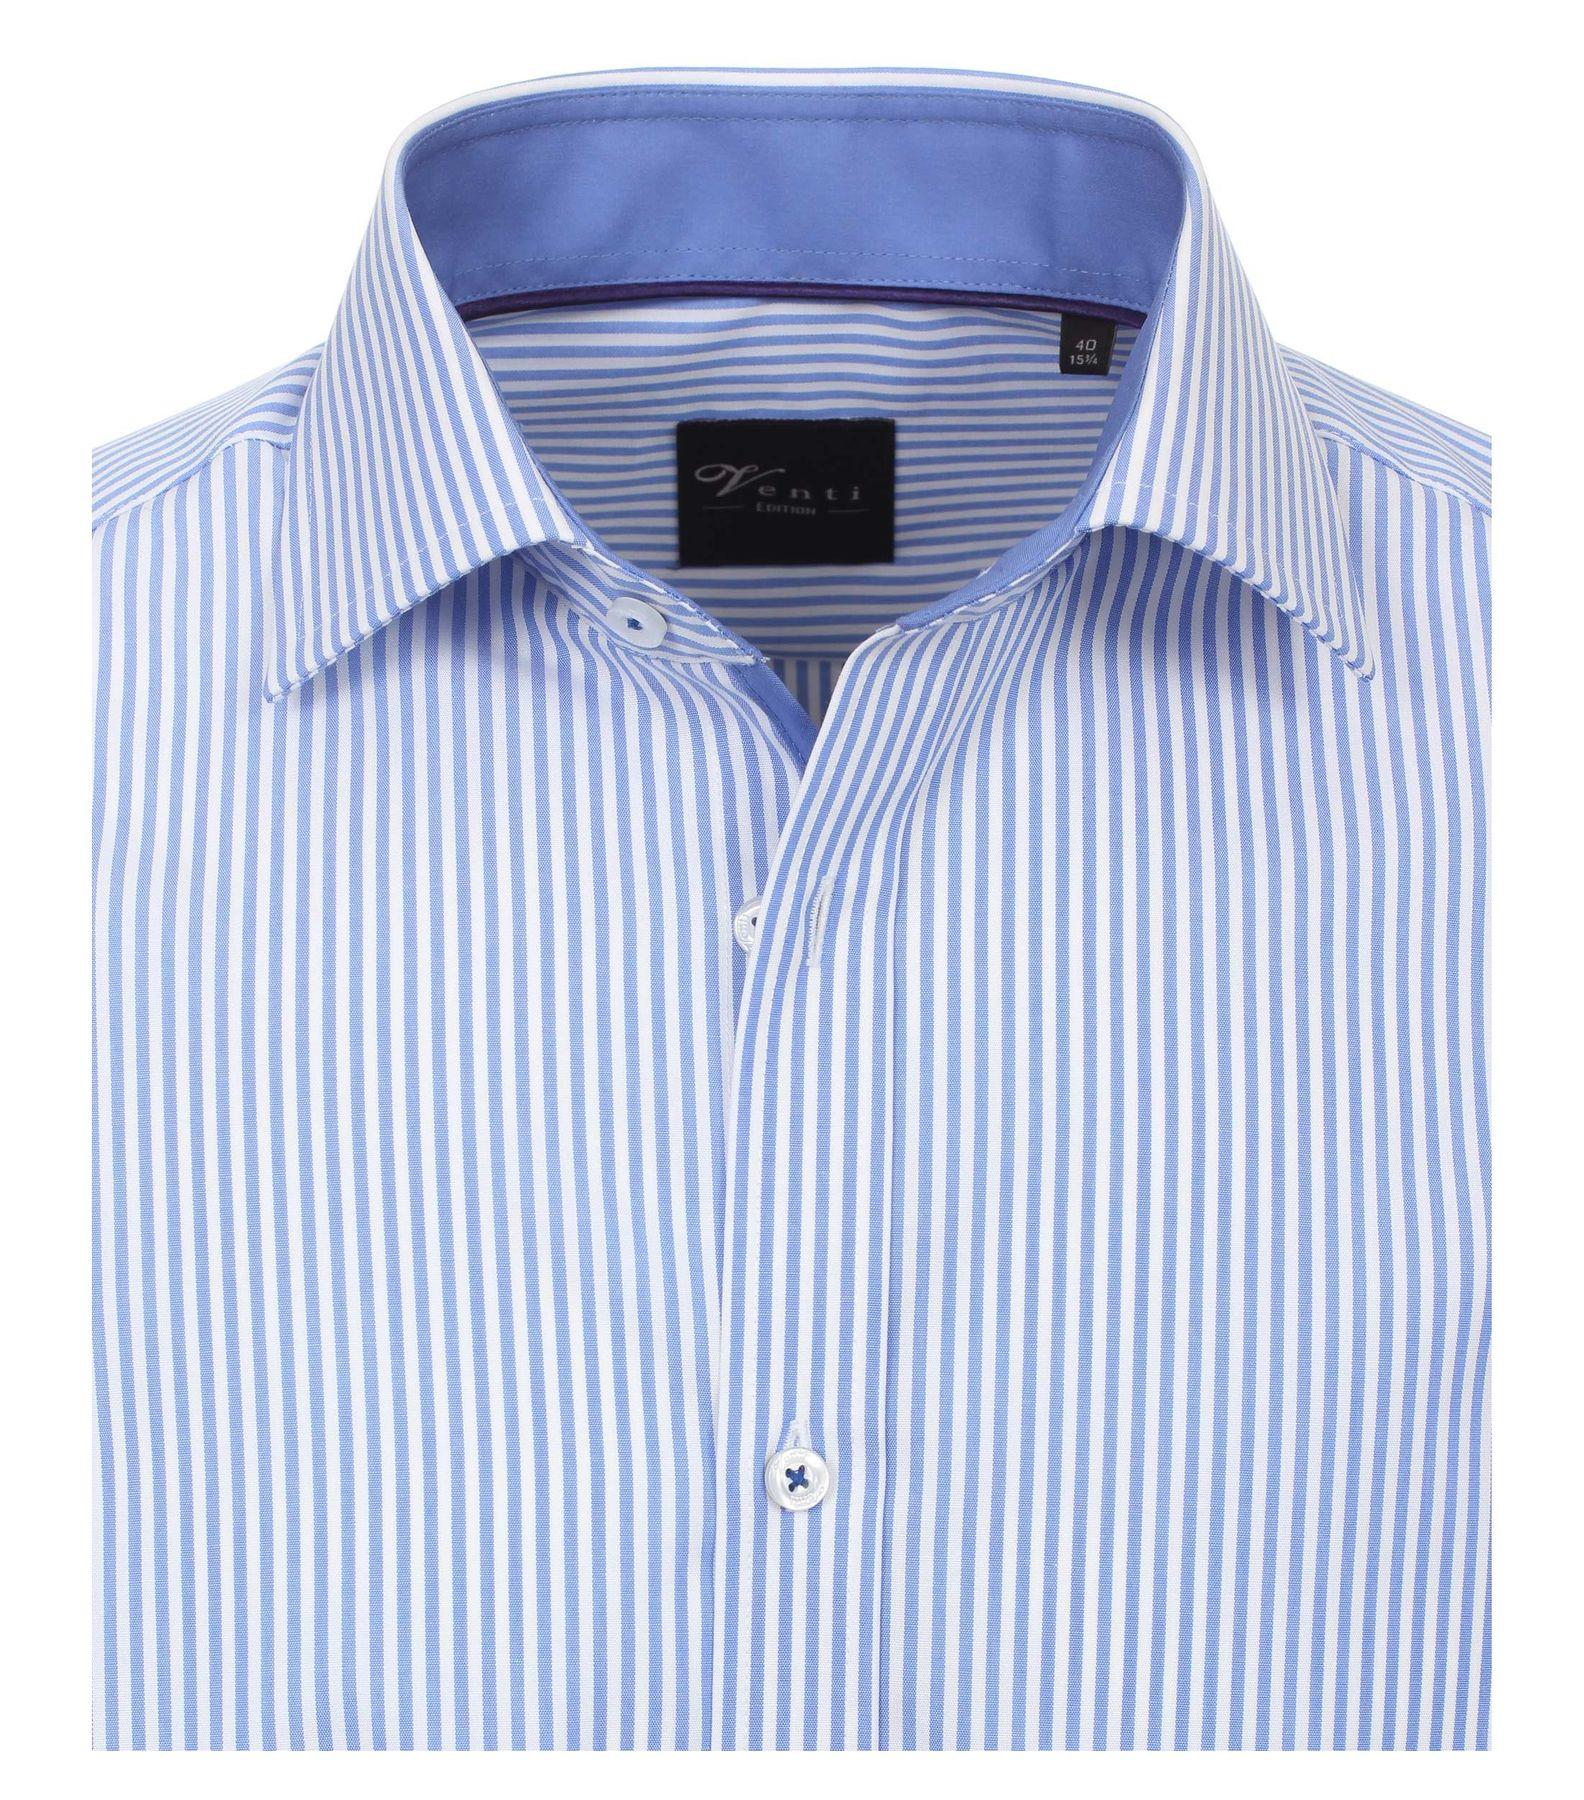 Venti - Slim Fit - Herren Popeline Hemd gestreift mit Kent Kragen (172726700) – Bild 3